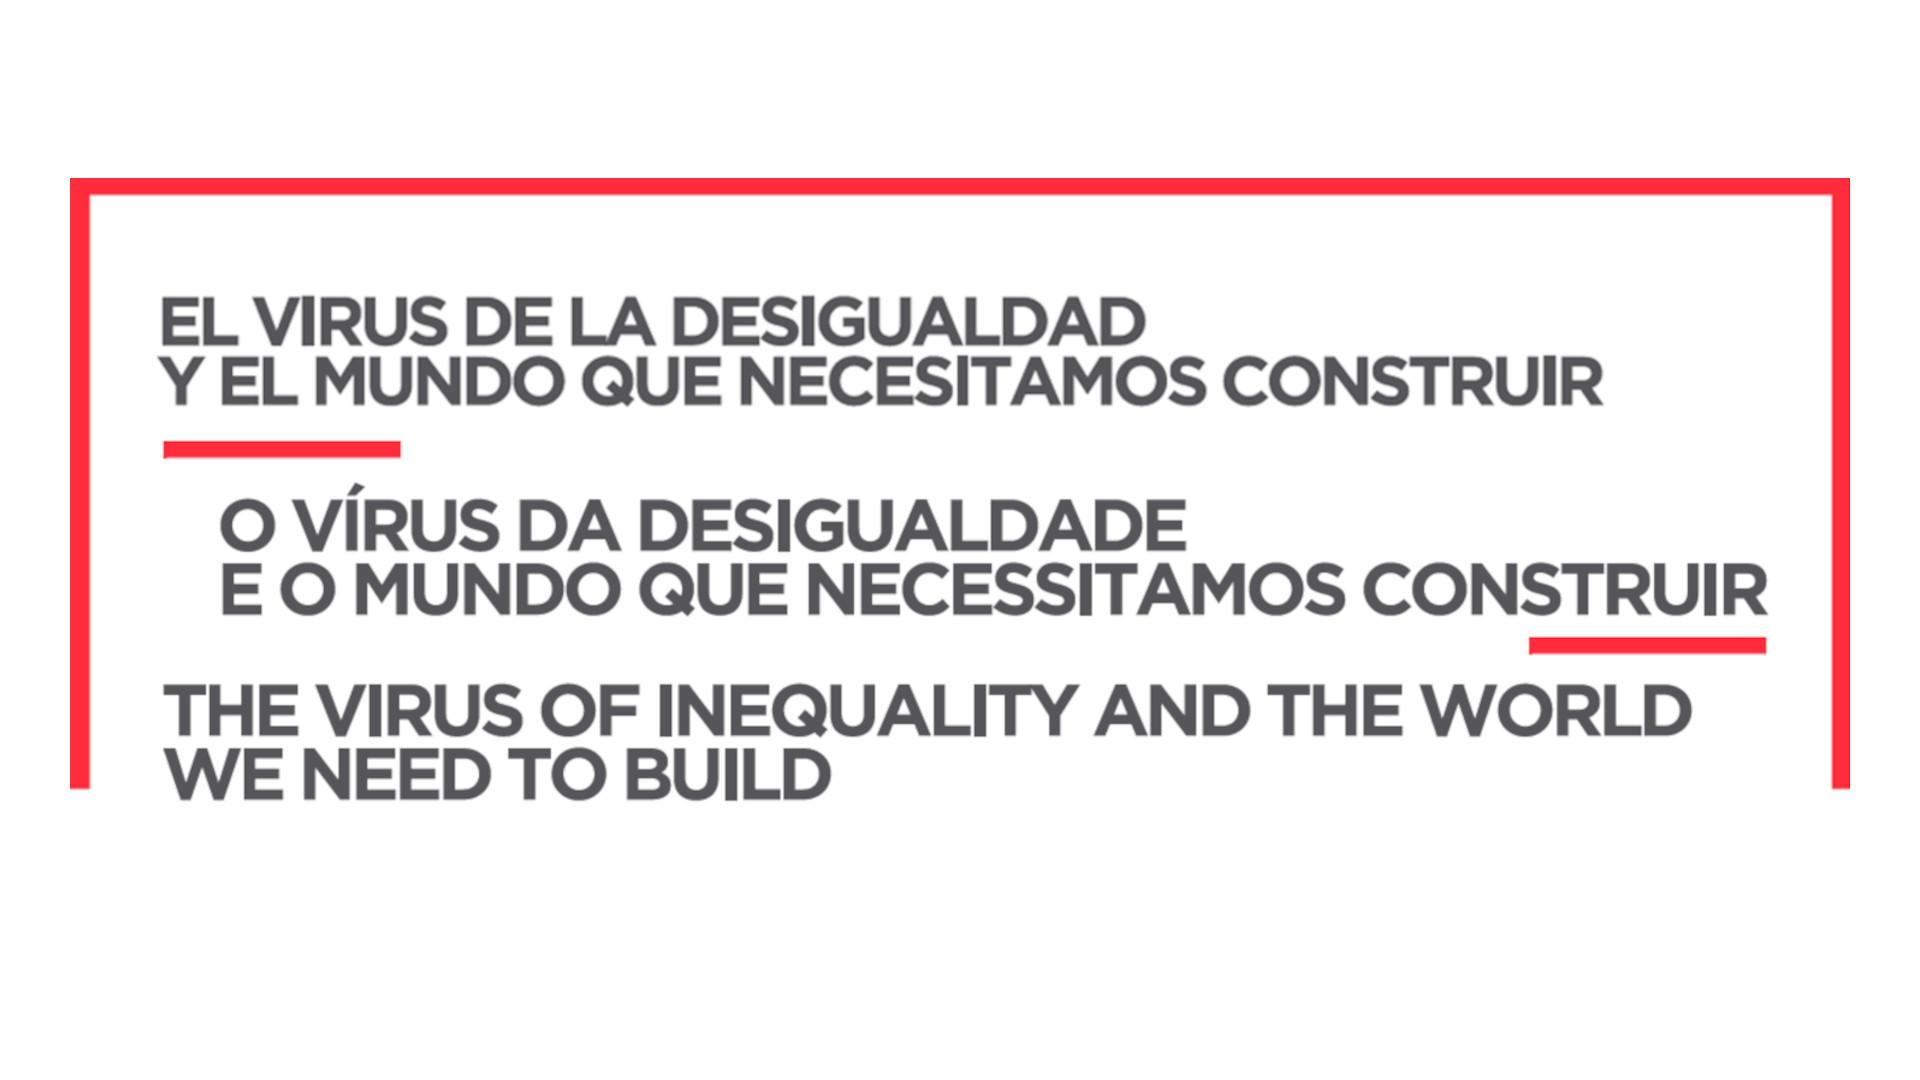 O vírus da desigualdade e o mundo que necessitamos construir